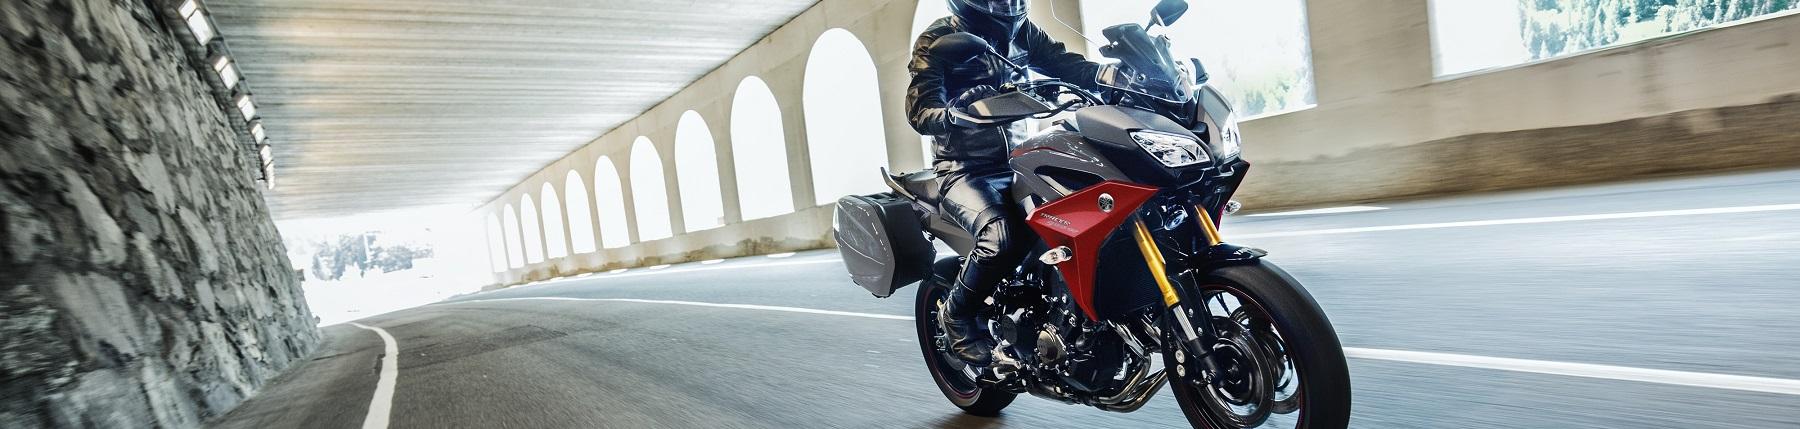 Yamaha sport toer motoren | MotorCentrumWest